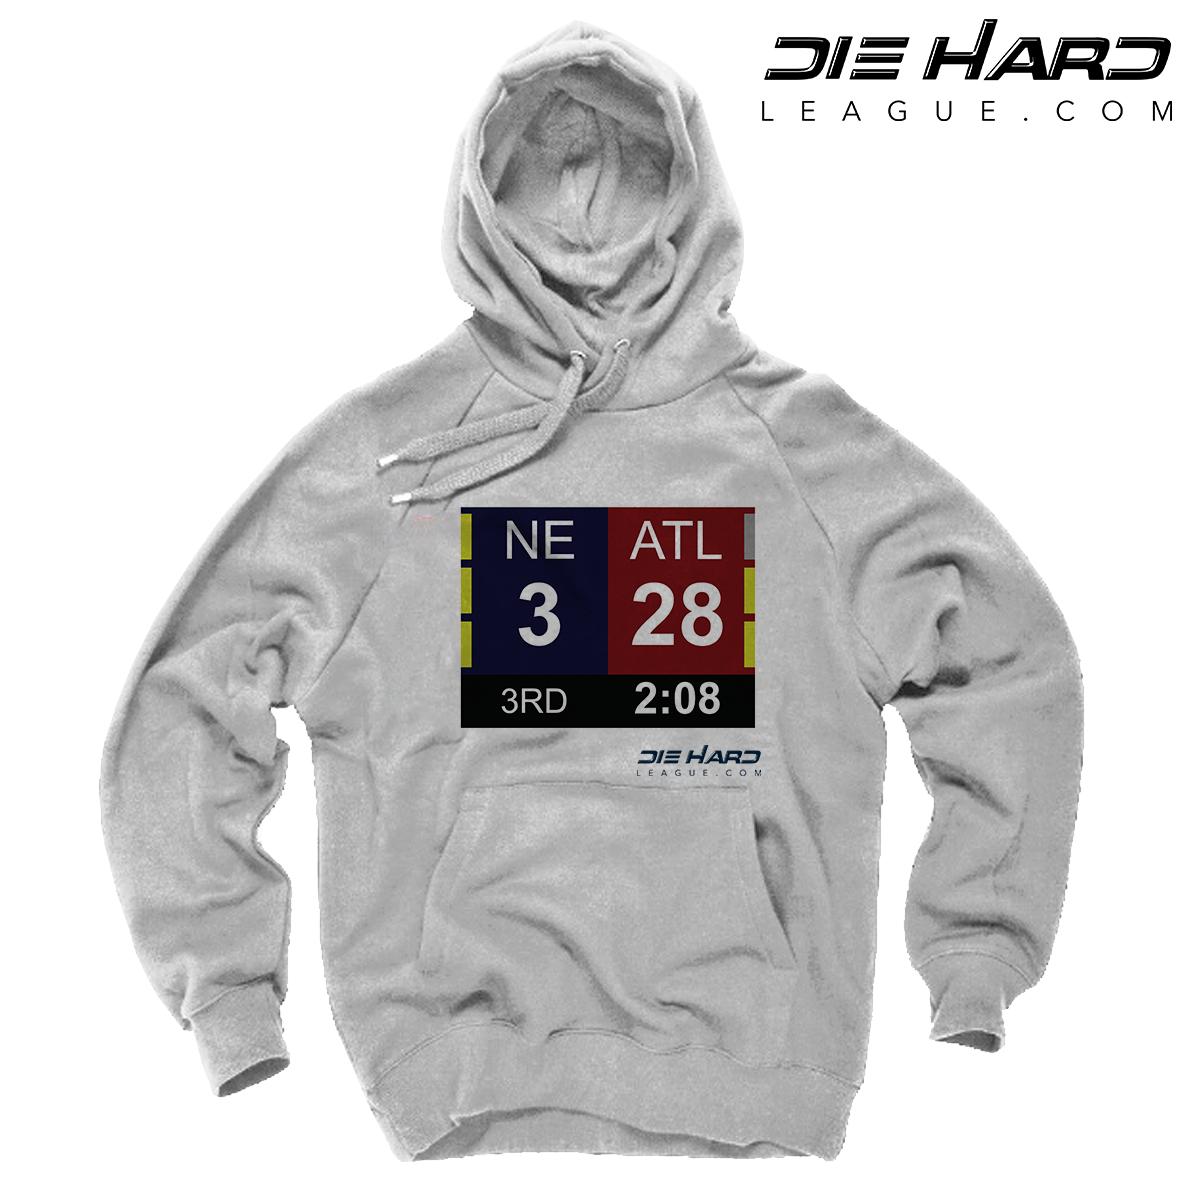 Patriots hooded sweatshirt patriots superbowl white sweatshirt png  1200x1200 Nfl new england patriots sweatshirt f73bec2eb